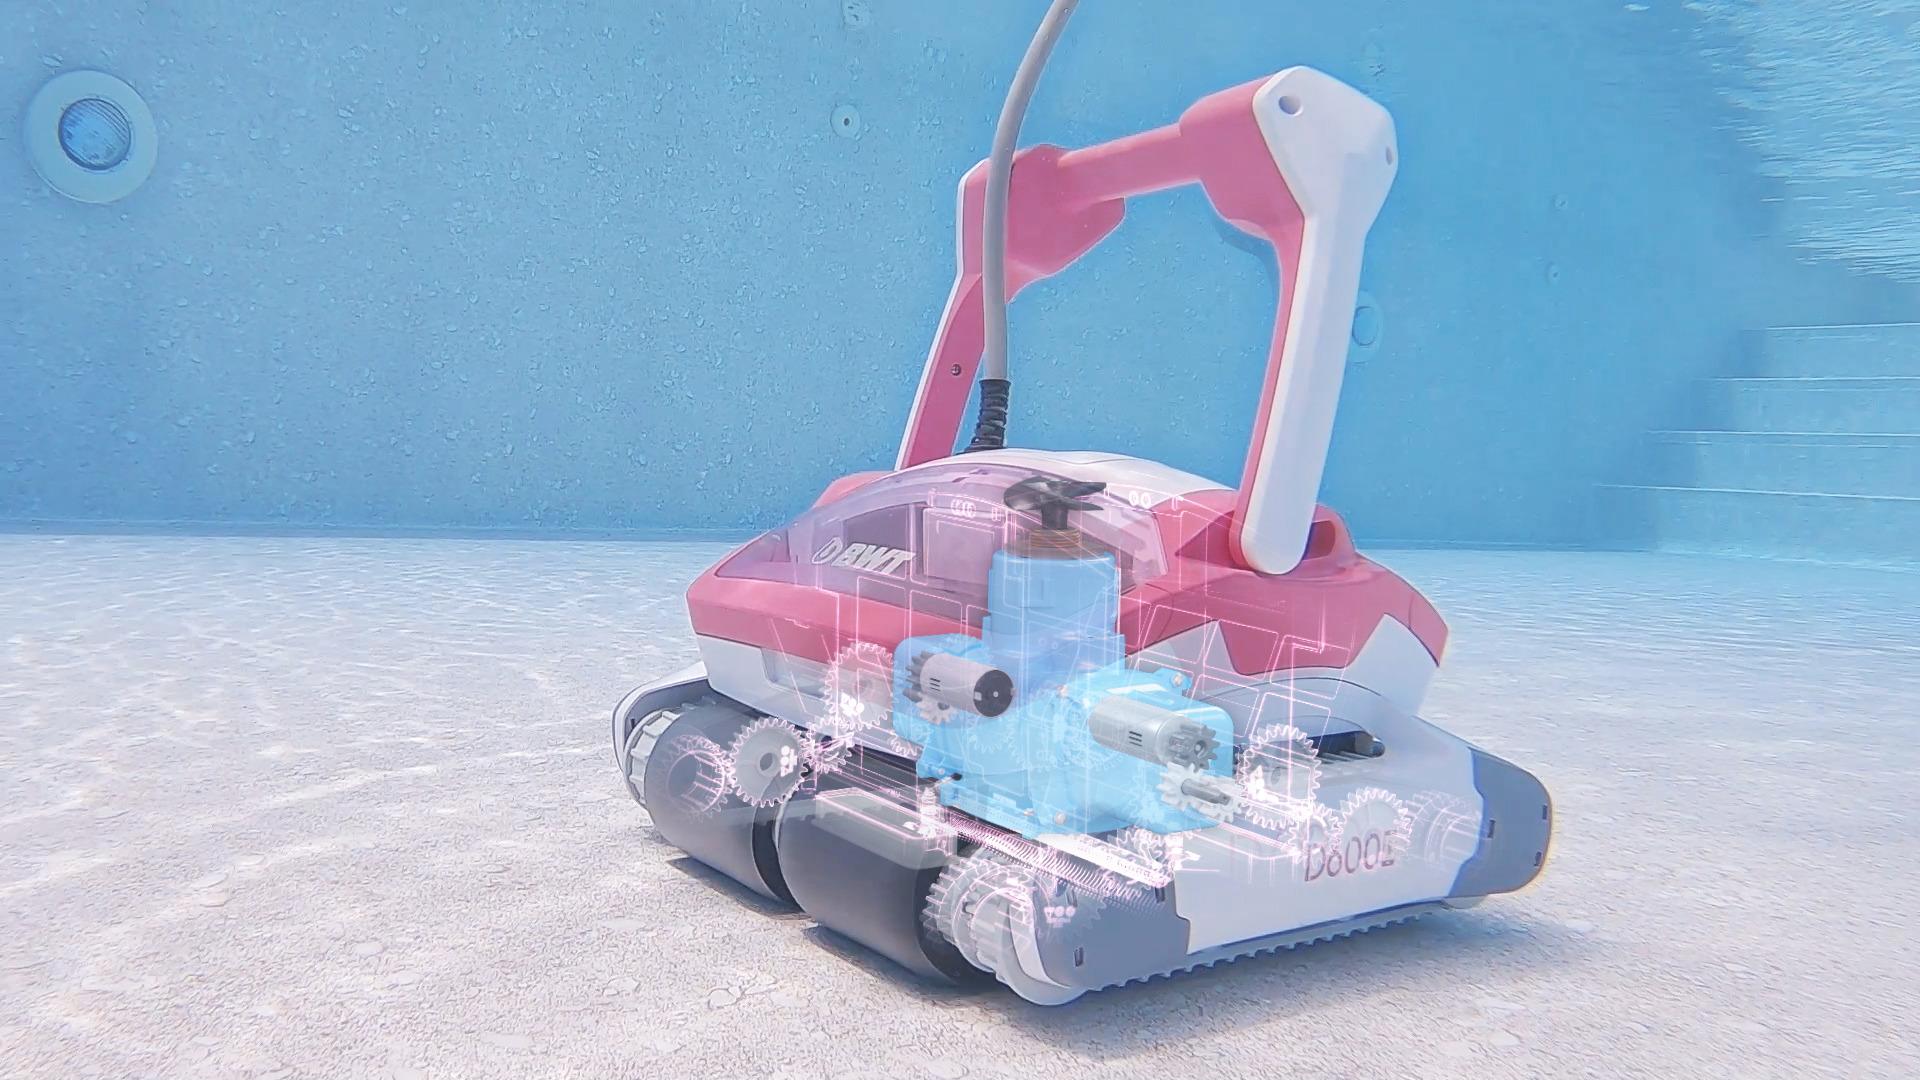 mood BWT Poolroboter D600